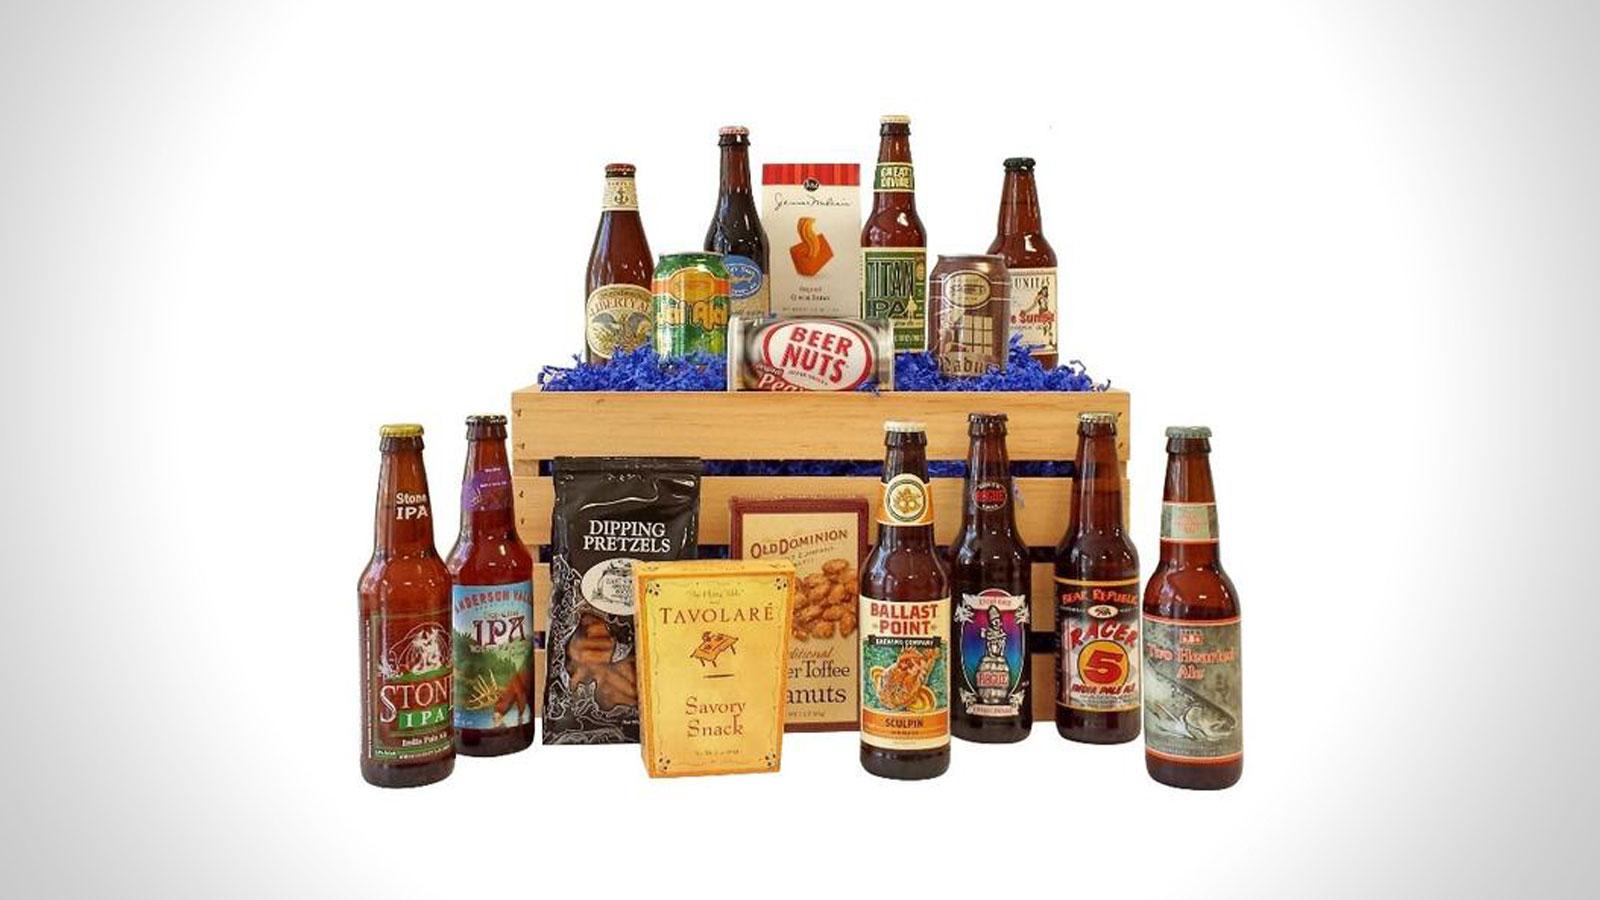 Give Them Beer Gift Baskets | Gifts For Men | Gift Baskets For Men